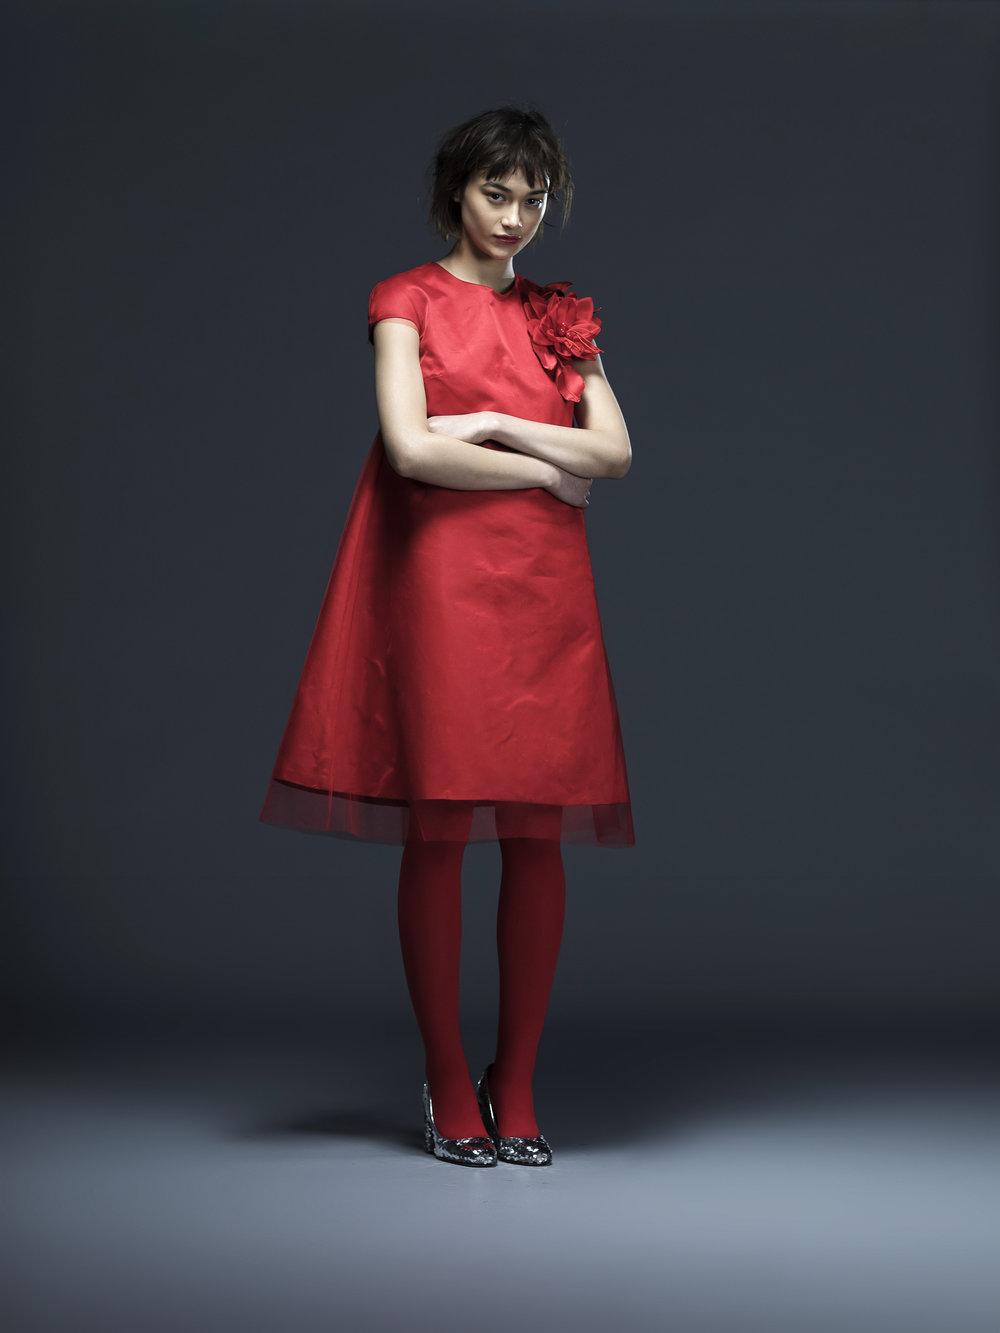 Helen Cody 2017 - Red-2657.jpg